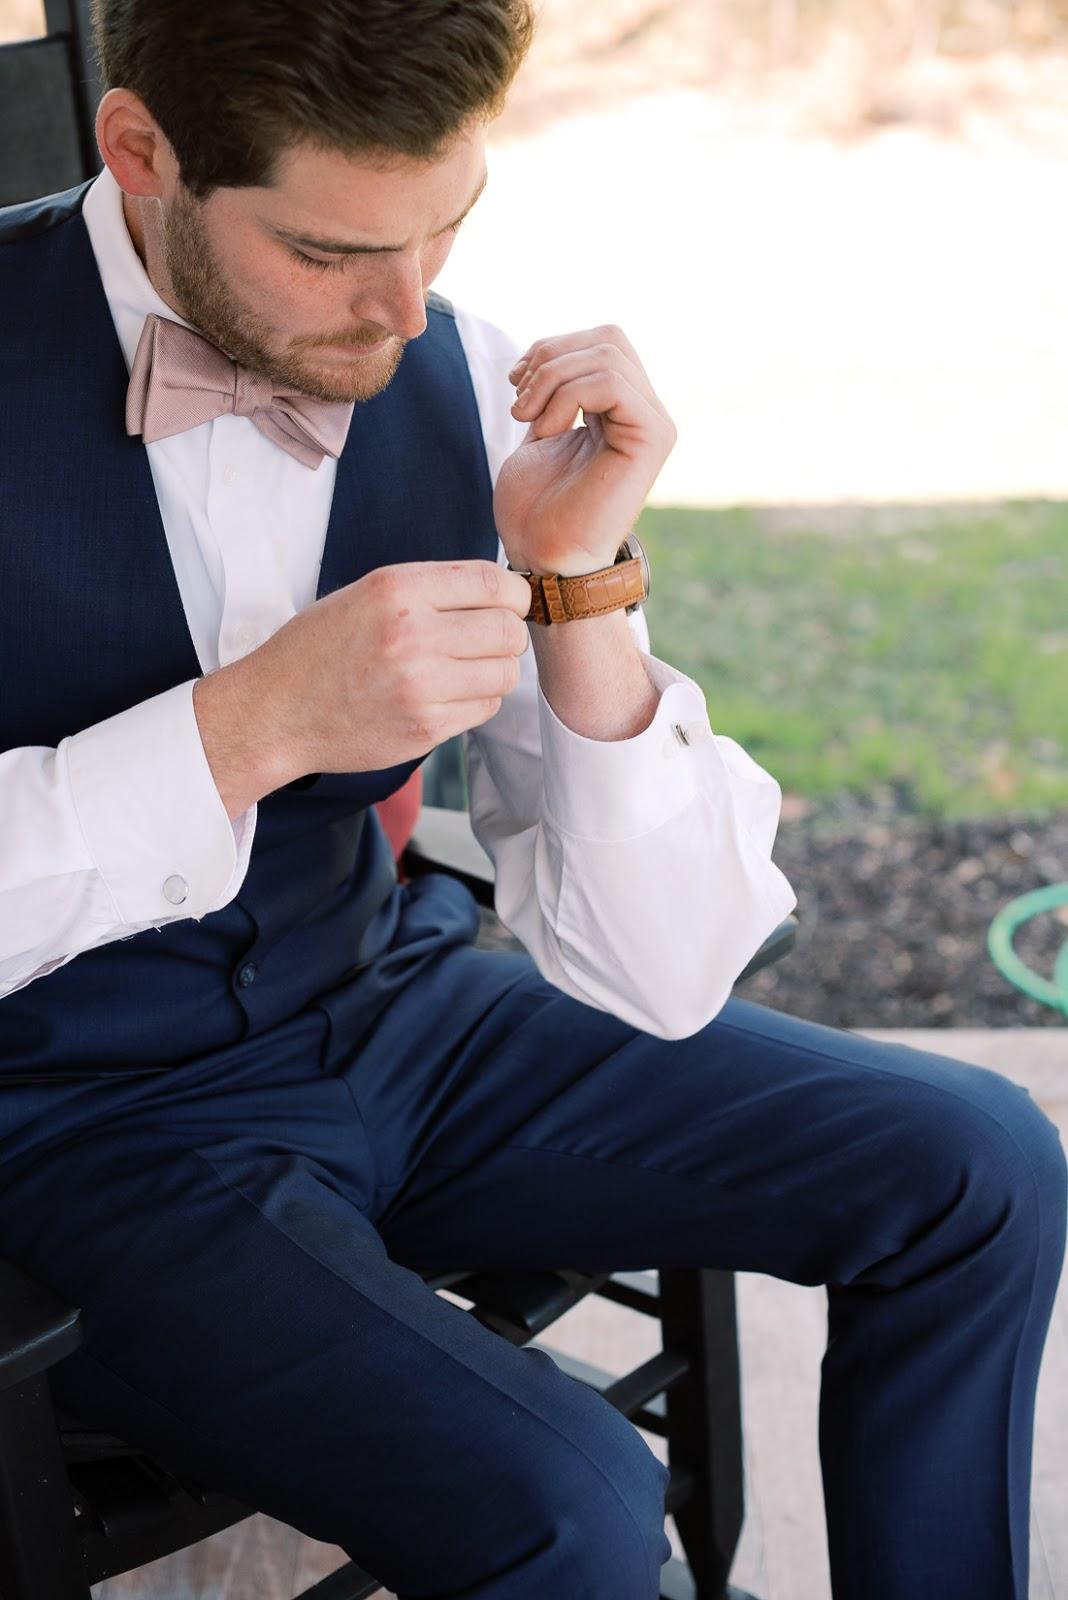 Hook and Gaff Watch Husband Wedding Gift - Chasing Cinderella